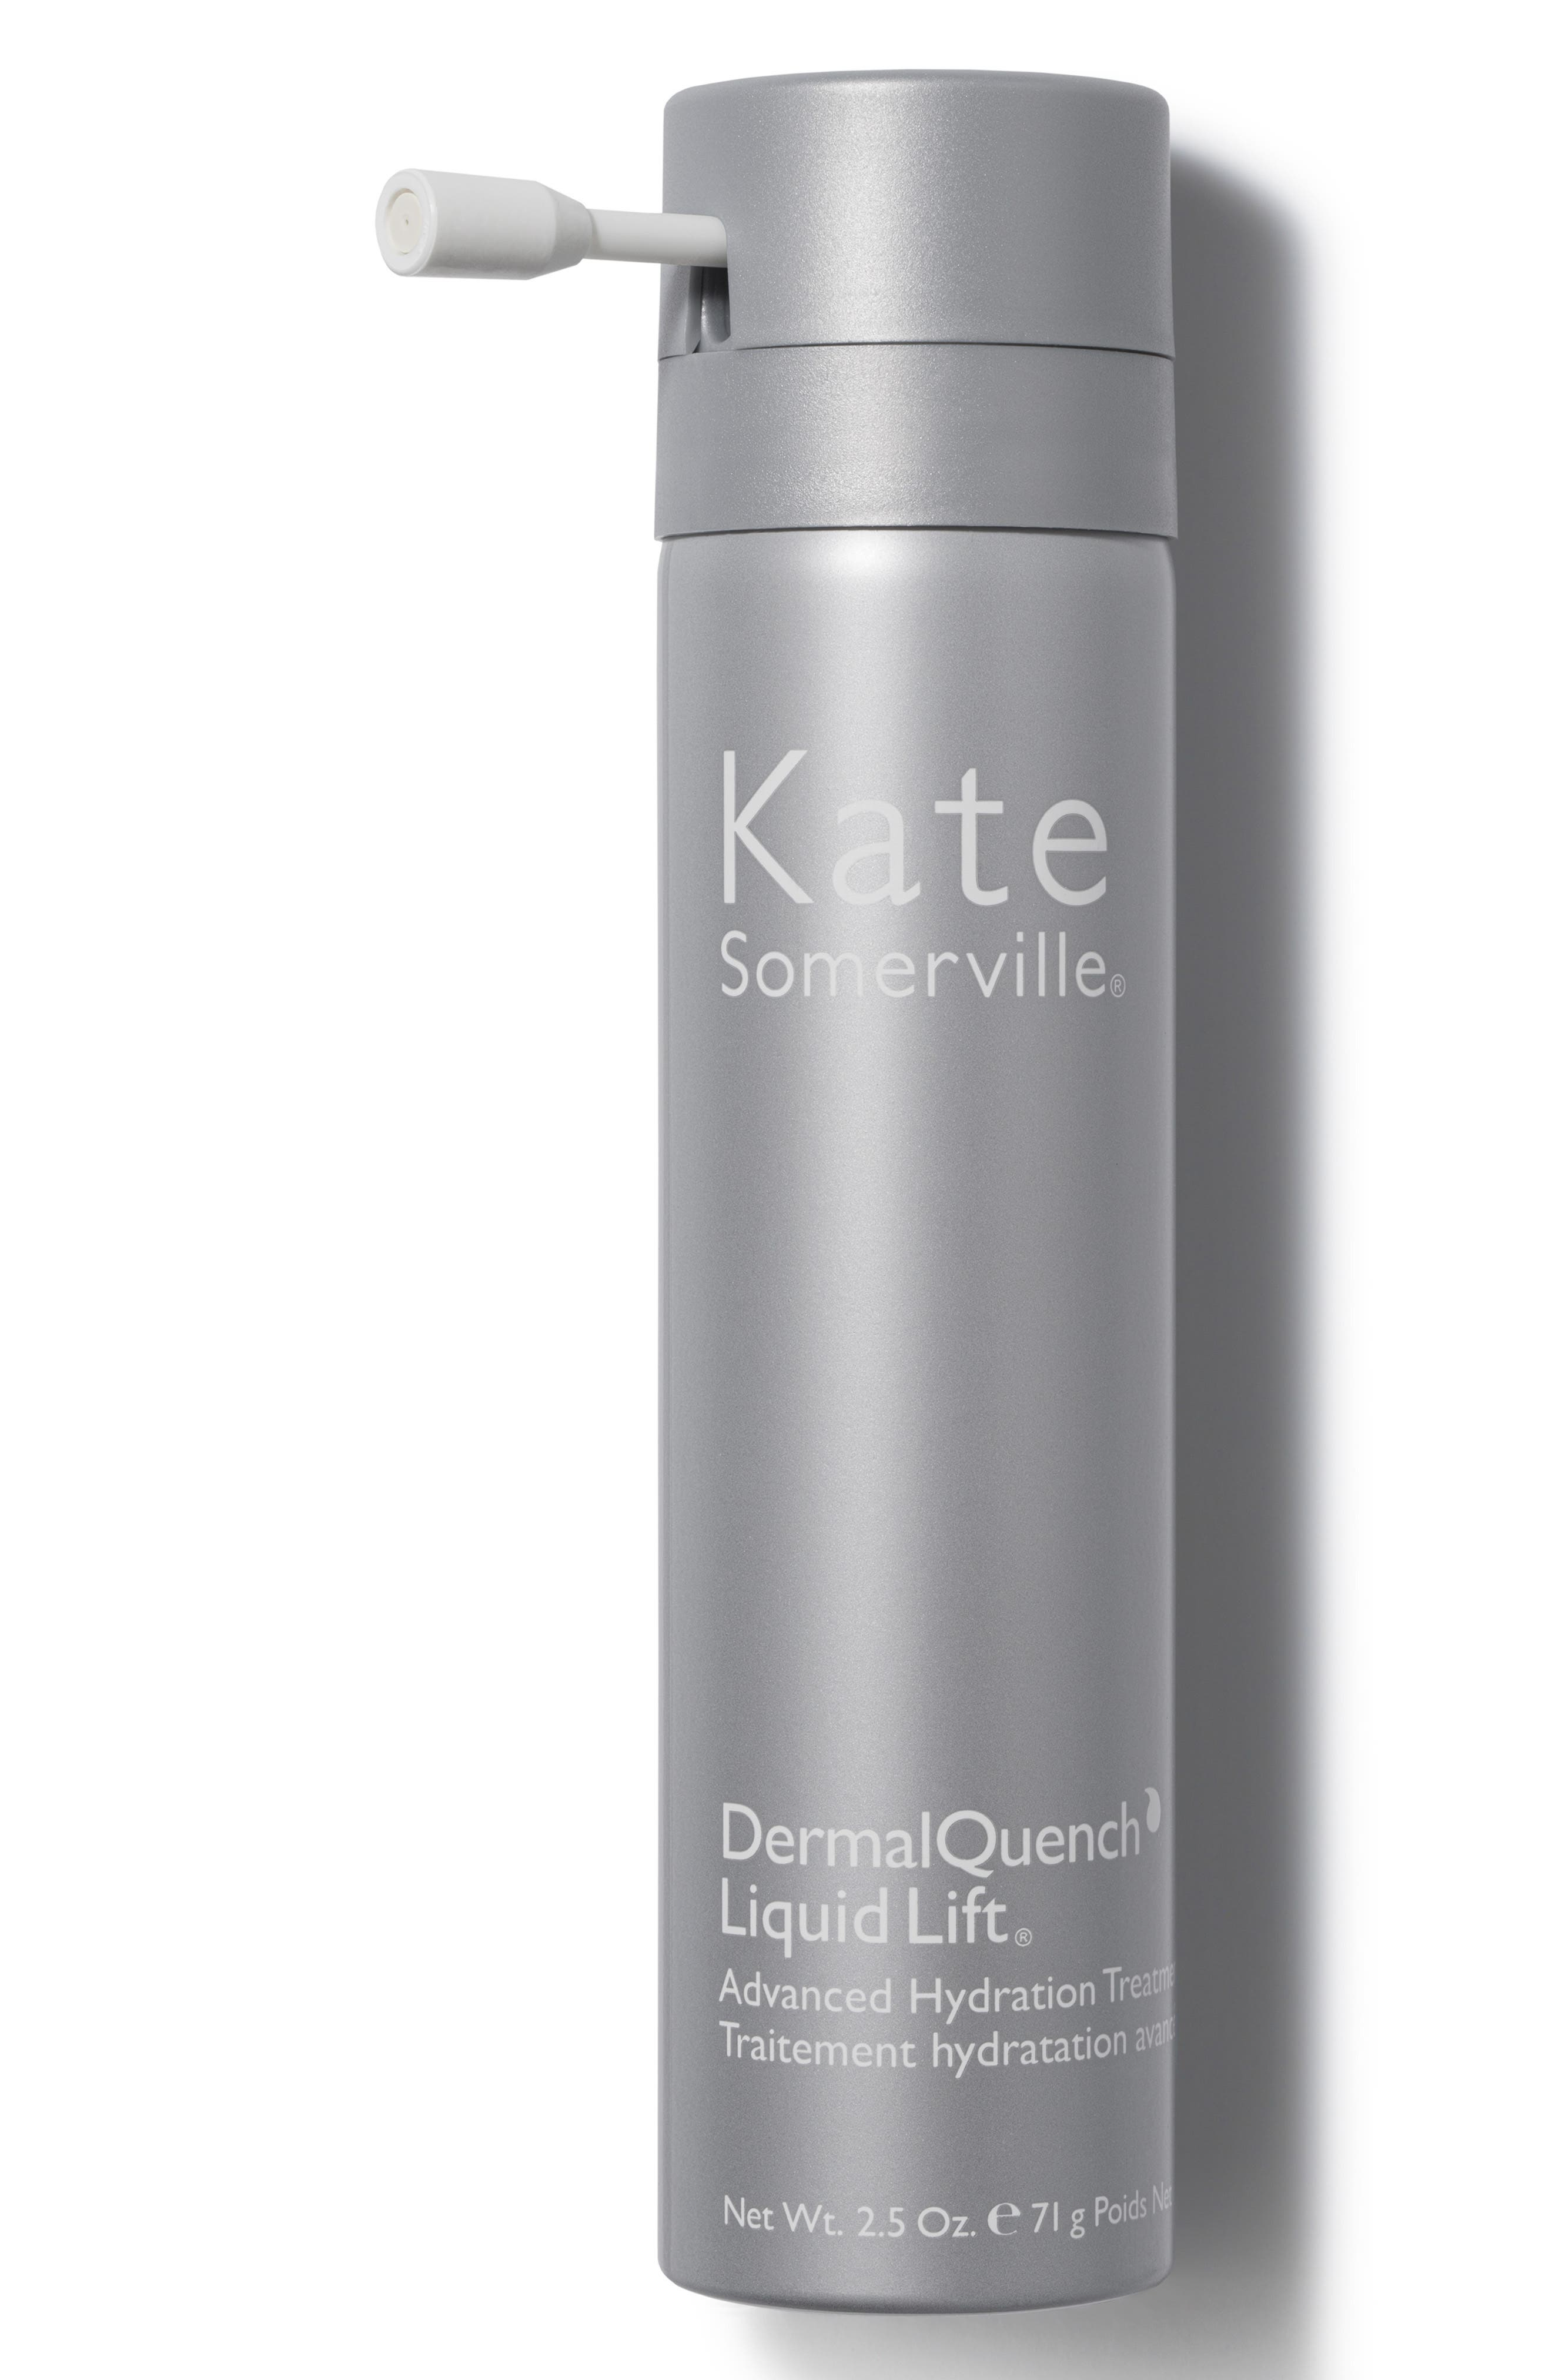 Kate Somerville Dermalquench Liquid Lift(TM) Advanced Wrinkle Treatment